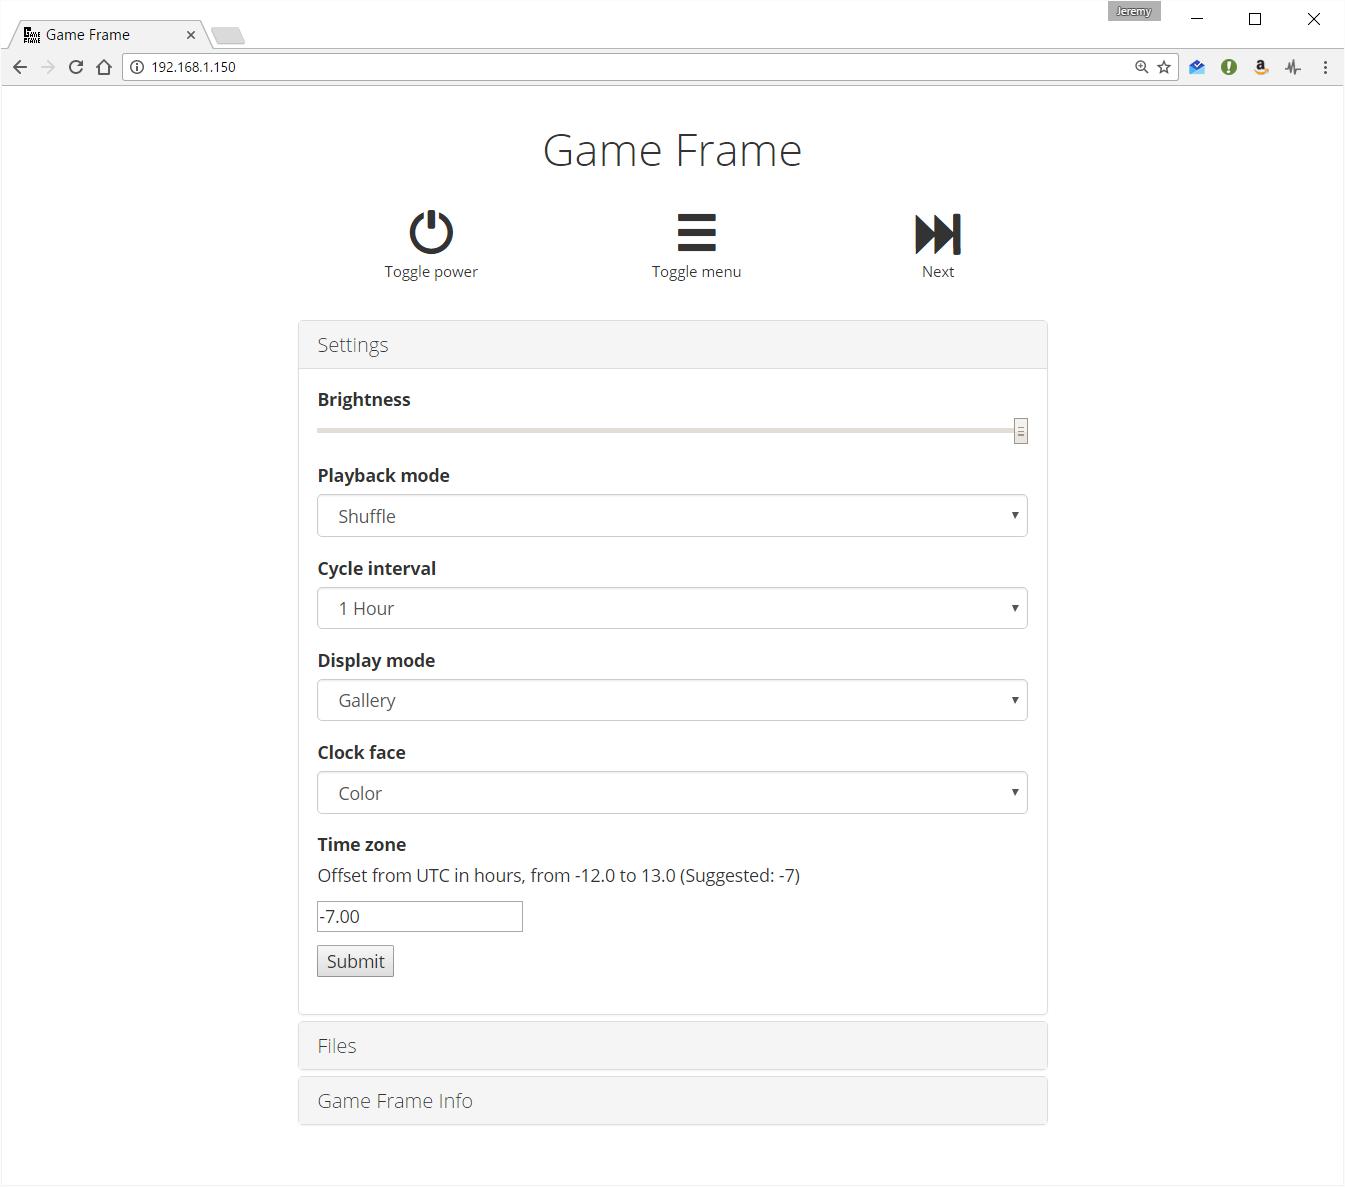 Game Frame Wi-Fi Adapter – LEDSEQ